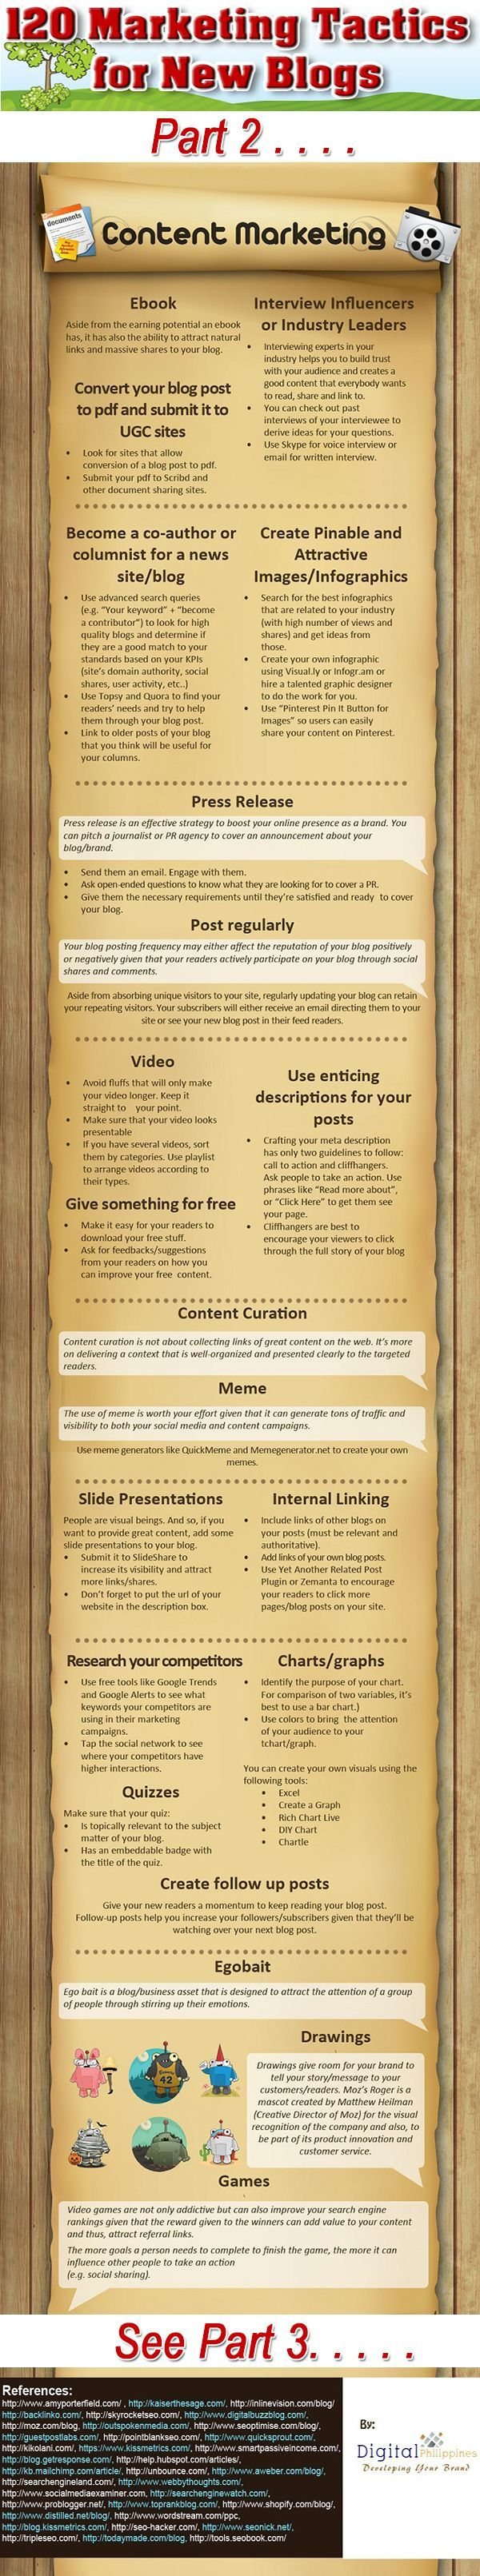 120 tips to promote your #Blog #business #socialmedia part 2 of a 9 part series. #infographic www.socialmediamamma.com